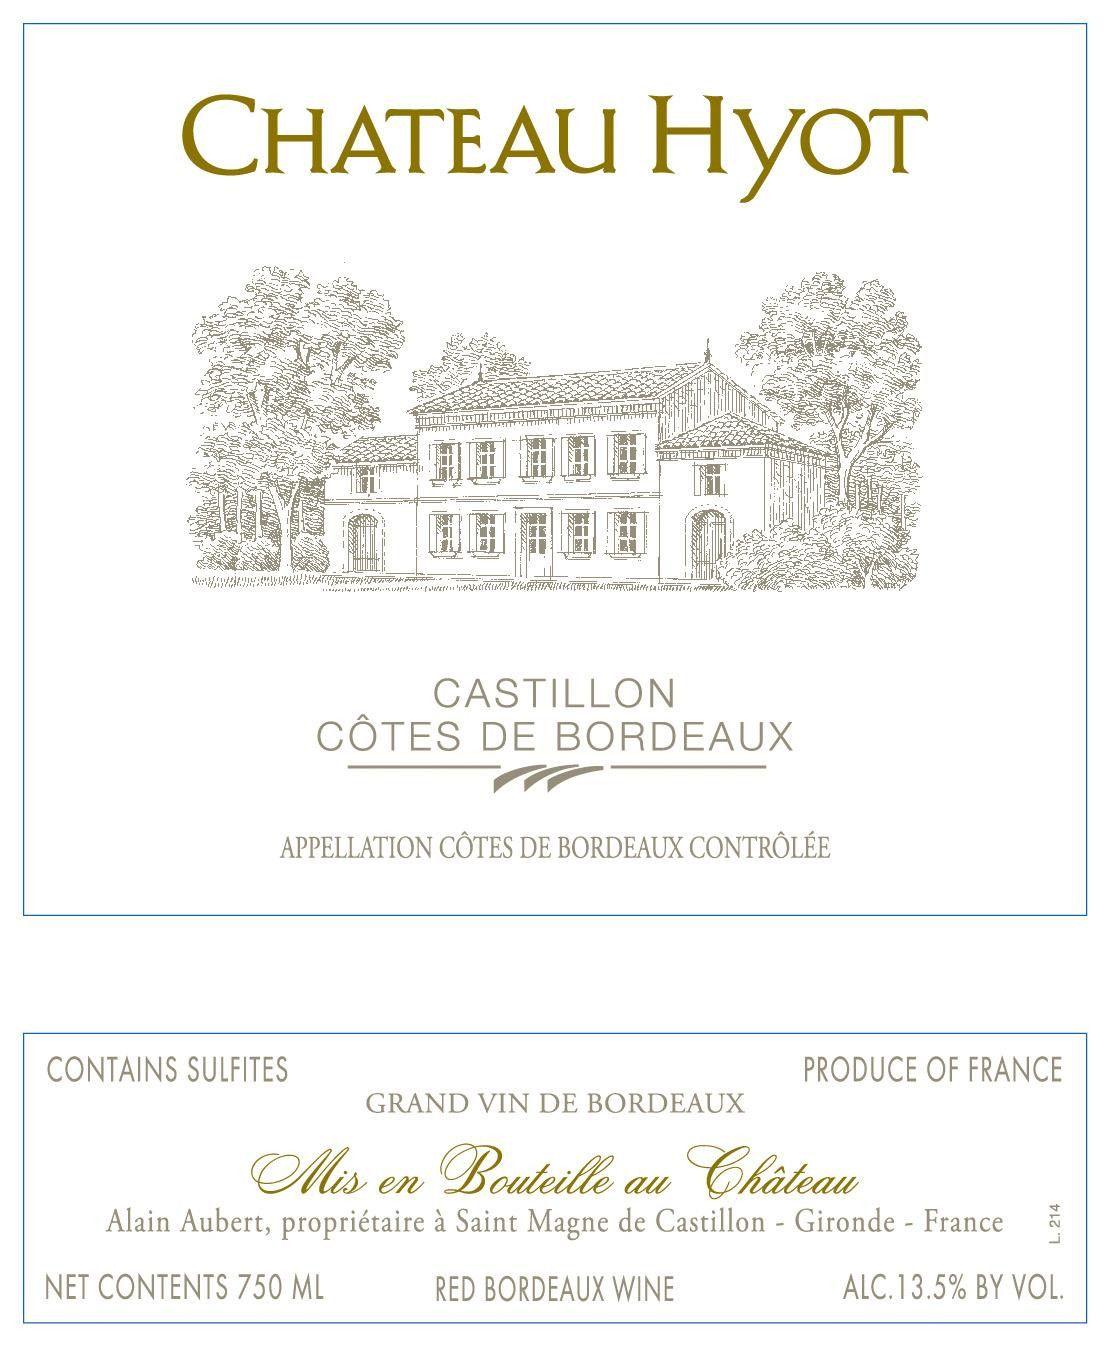 Chateau Hyot 2018